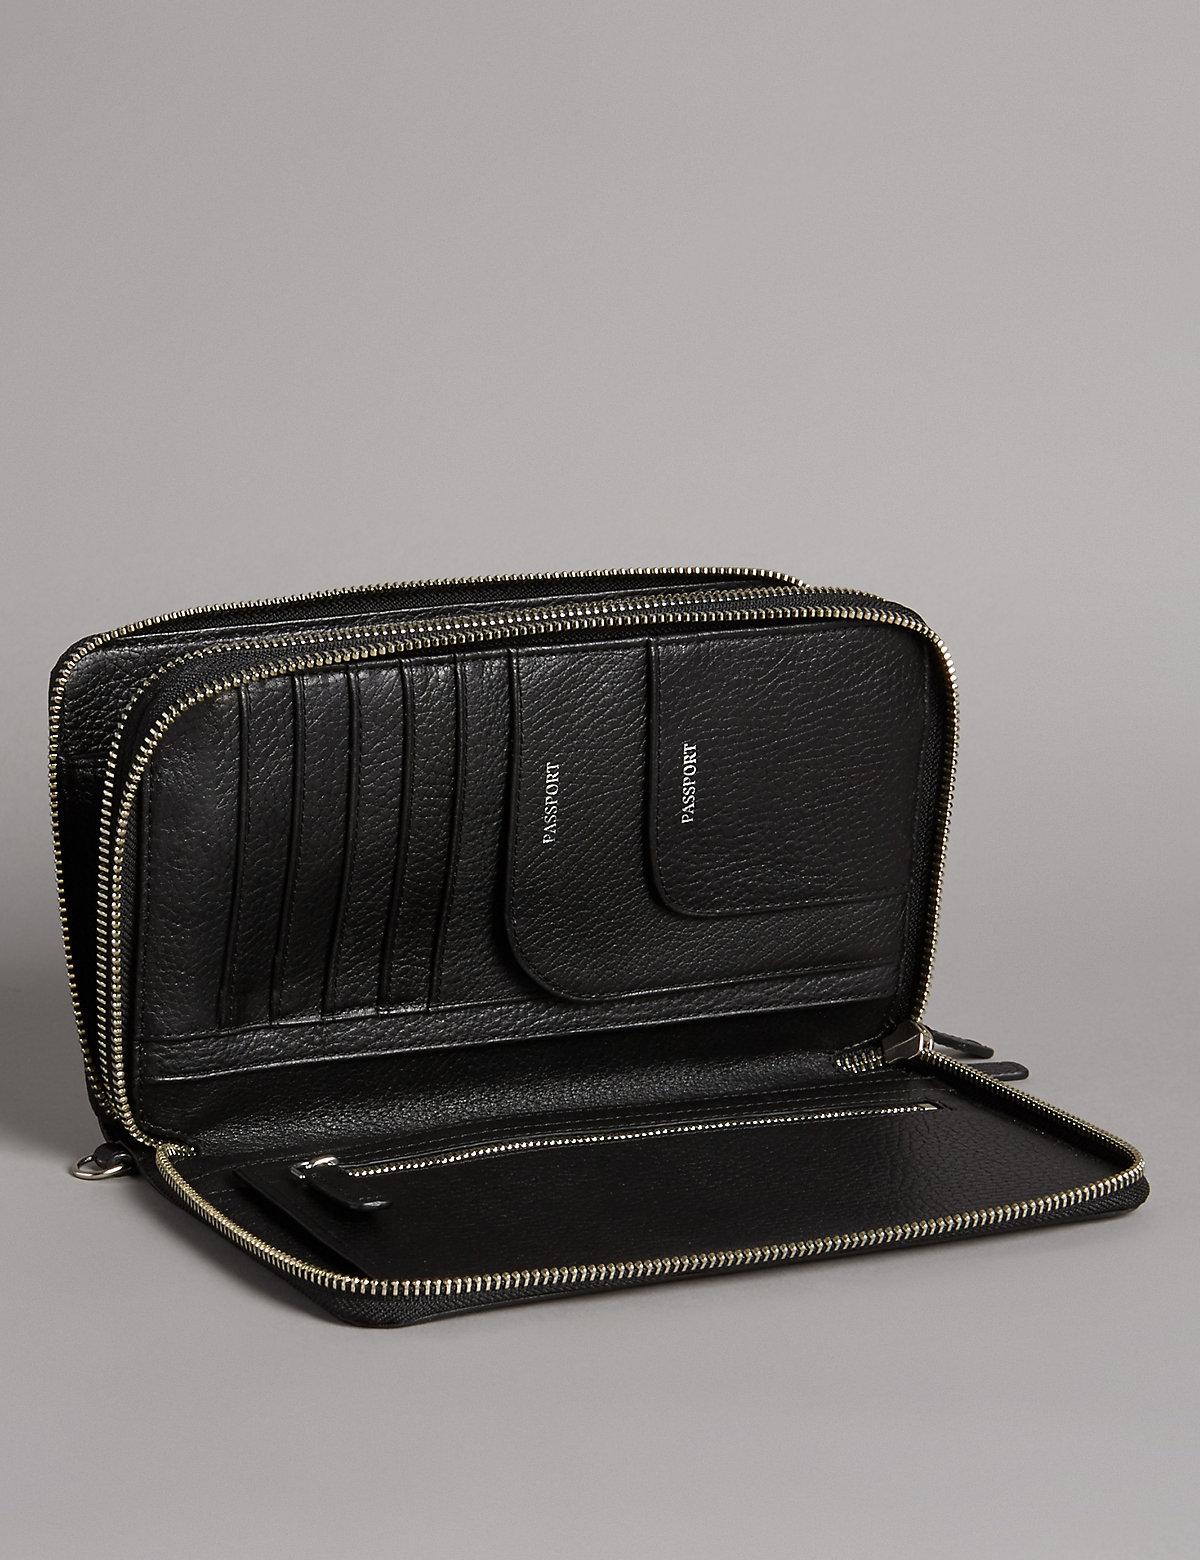 Autograph Luxury Leather Double Travel Wallet